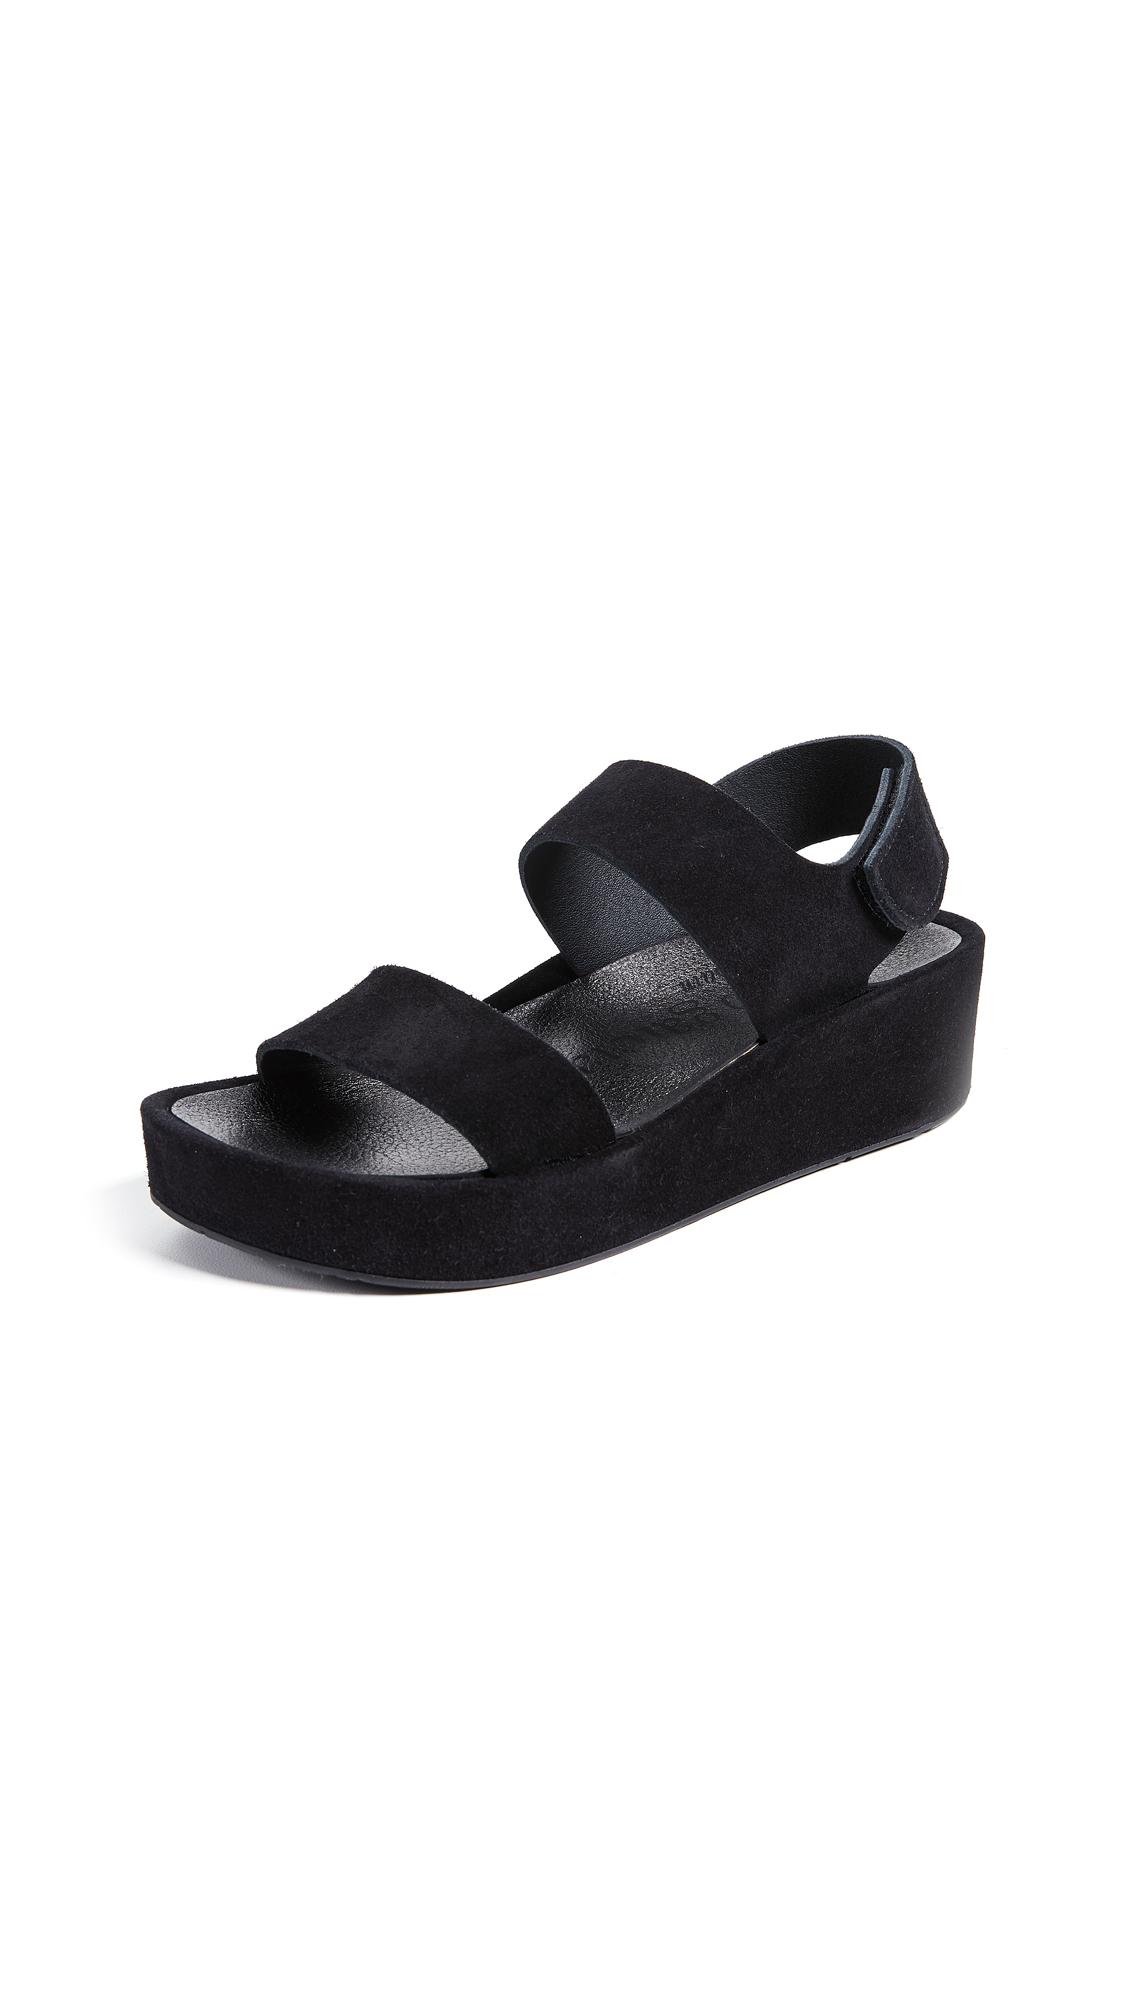 Lacey Platform Sandals, Black